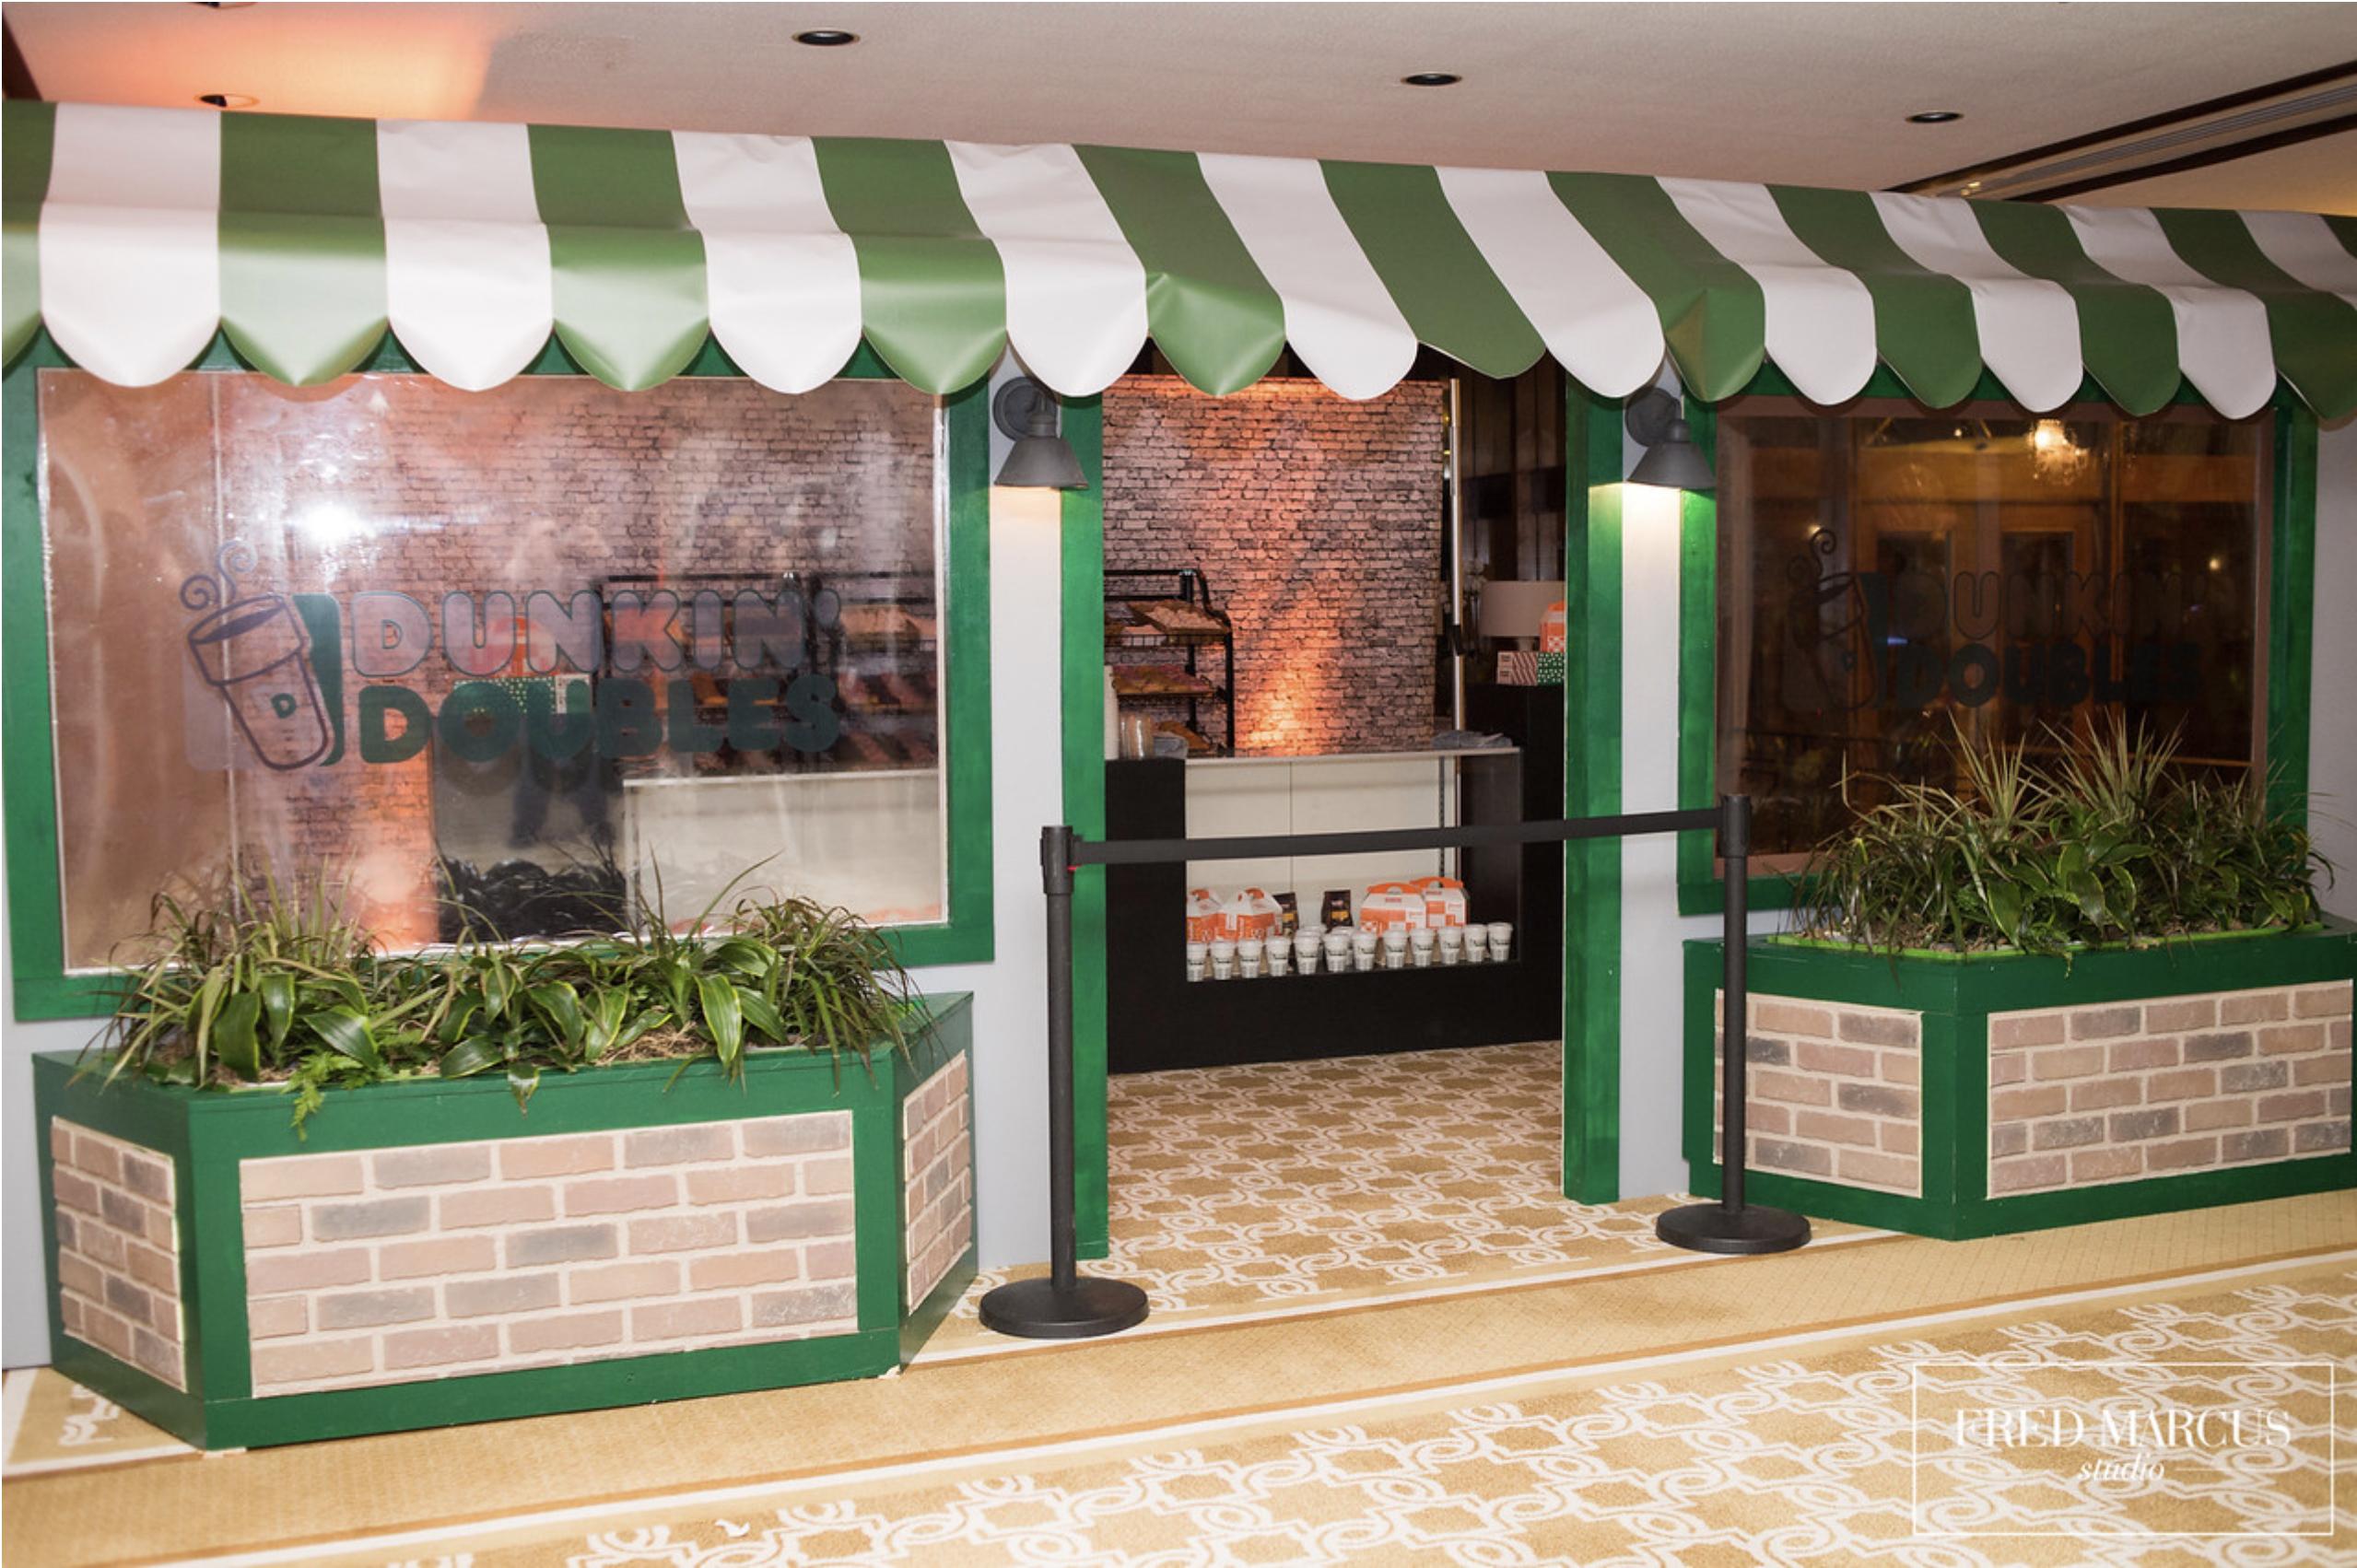 hank-lane-party-extras-storefront-food-kiosk